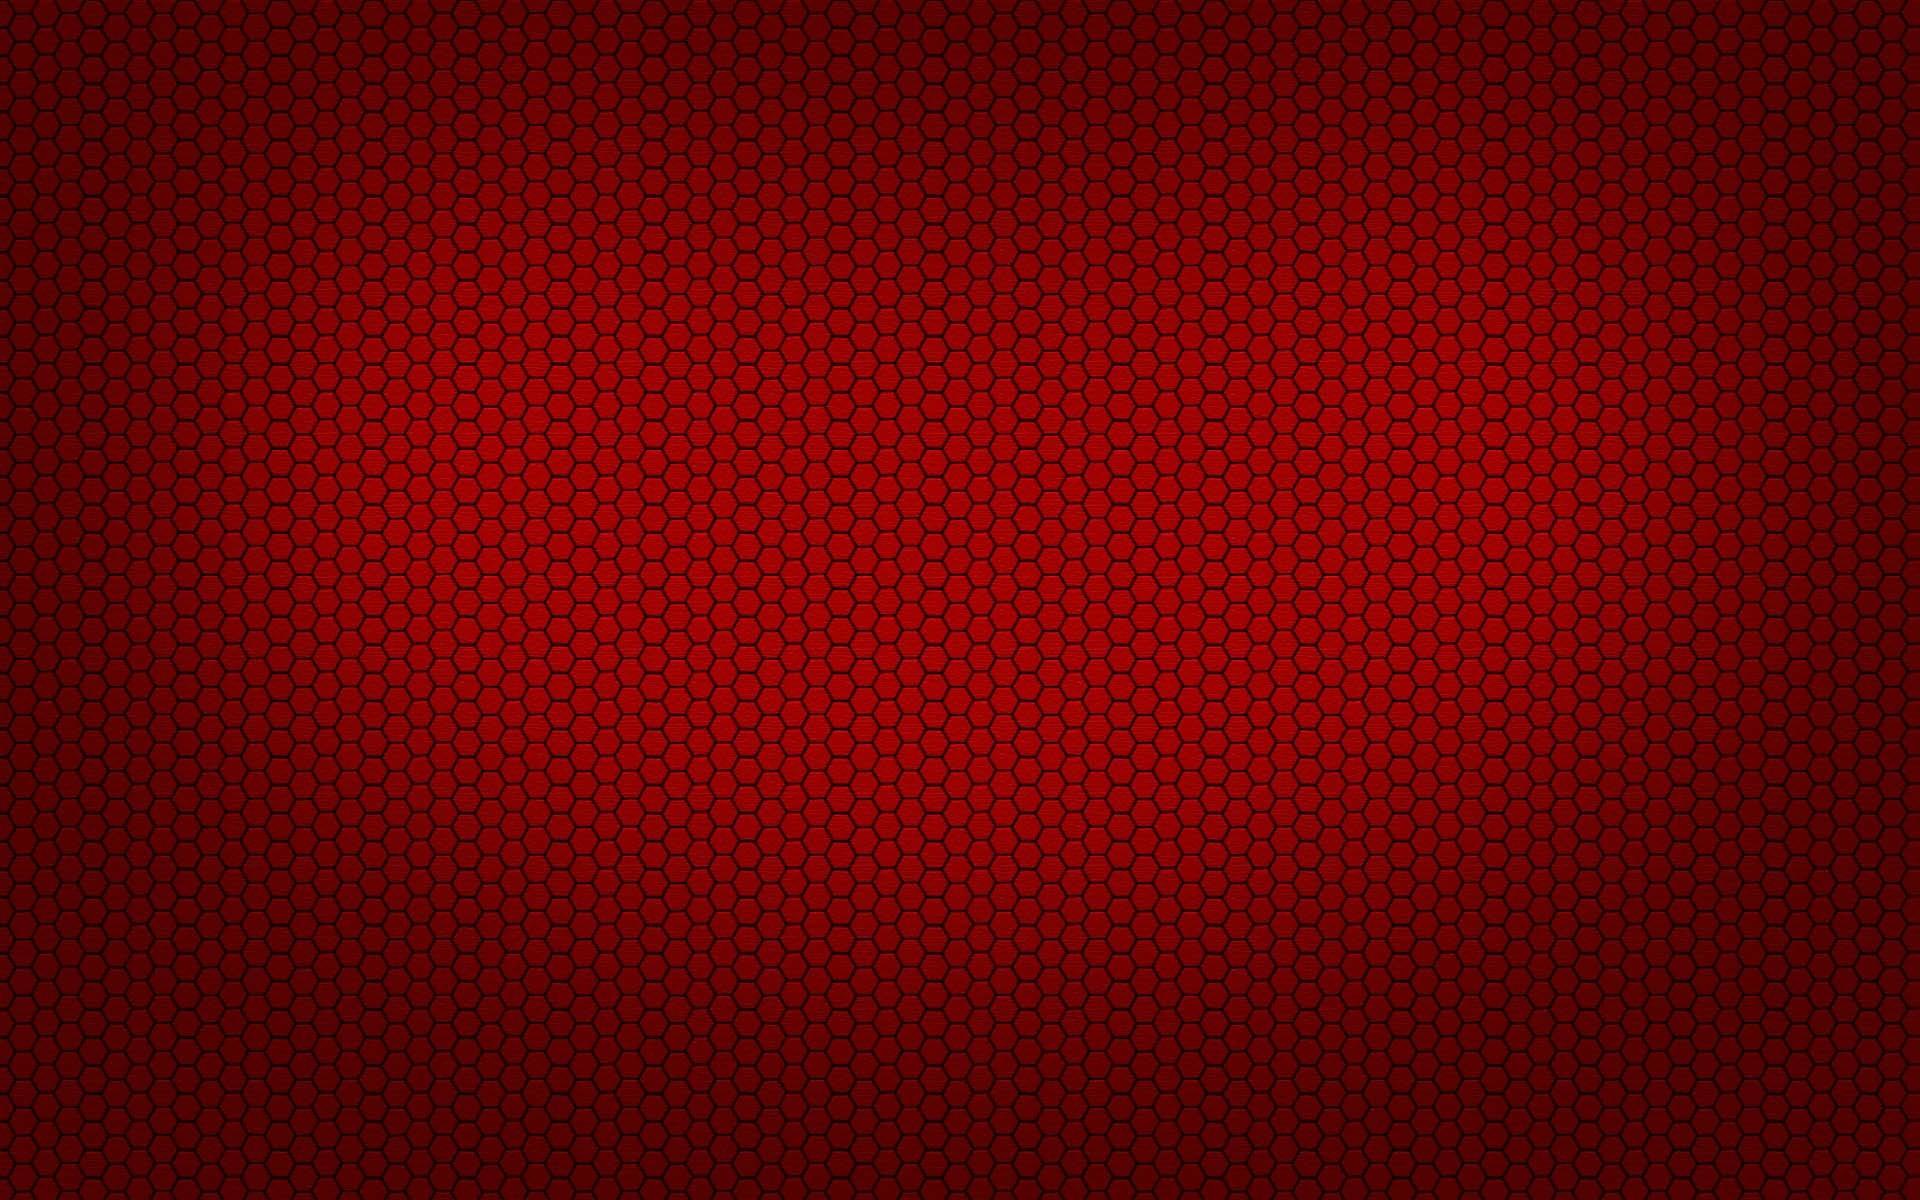 Textured Red Wallpaper ·① WallpaperTag